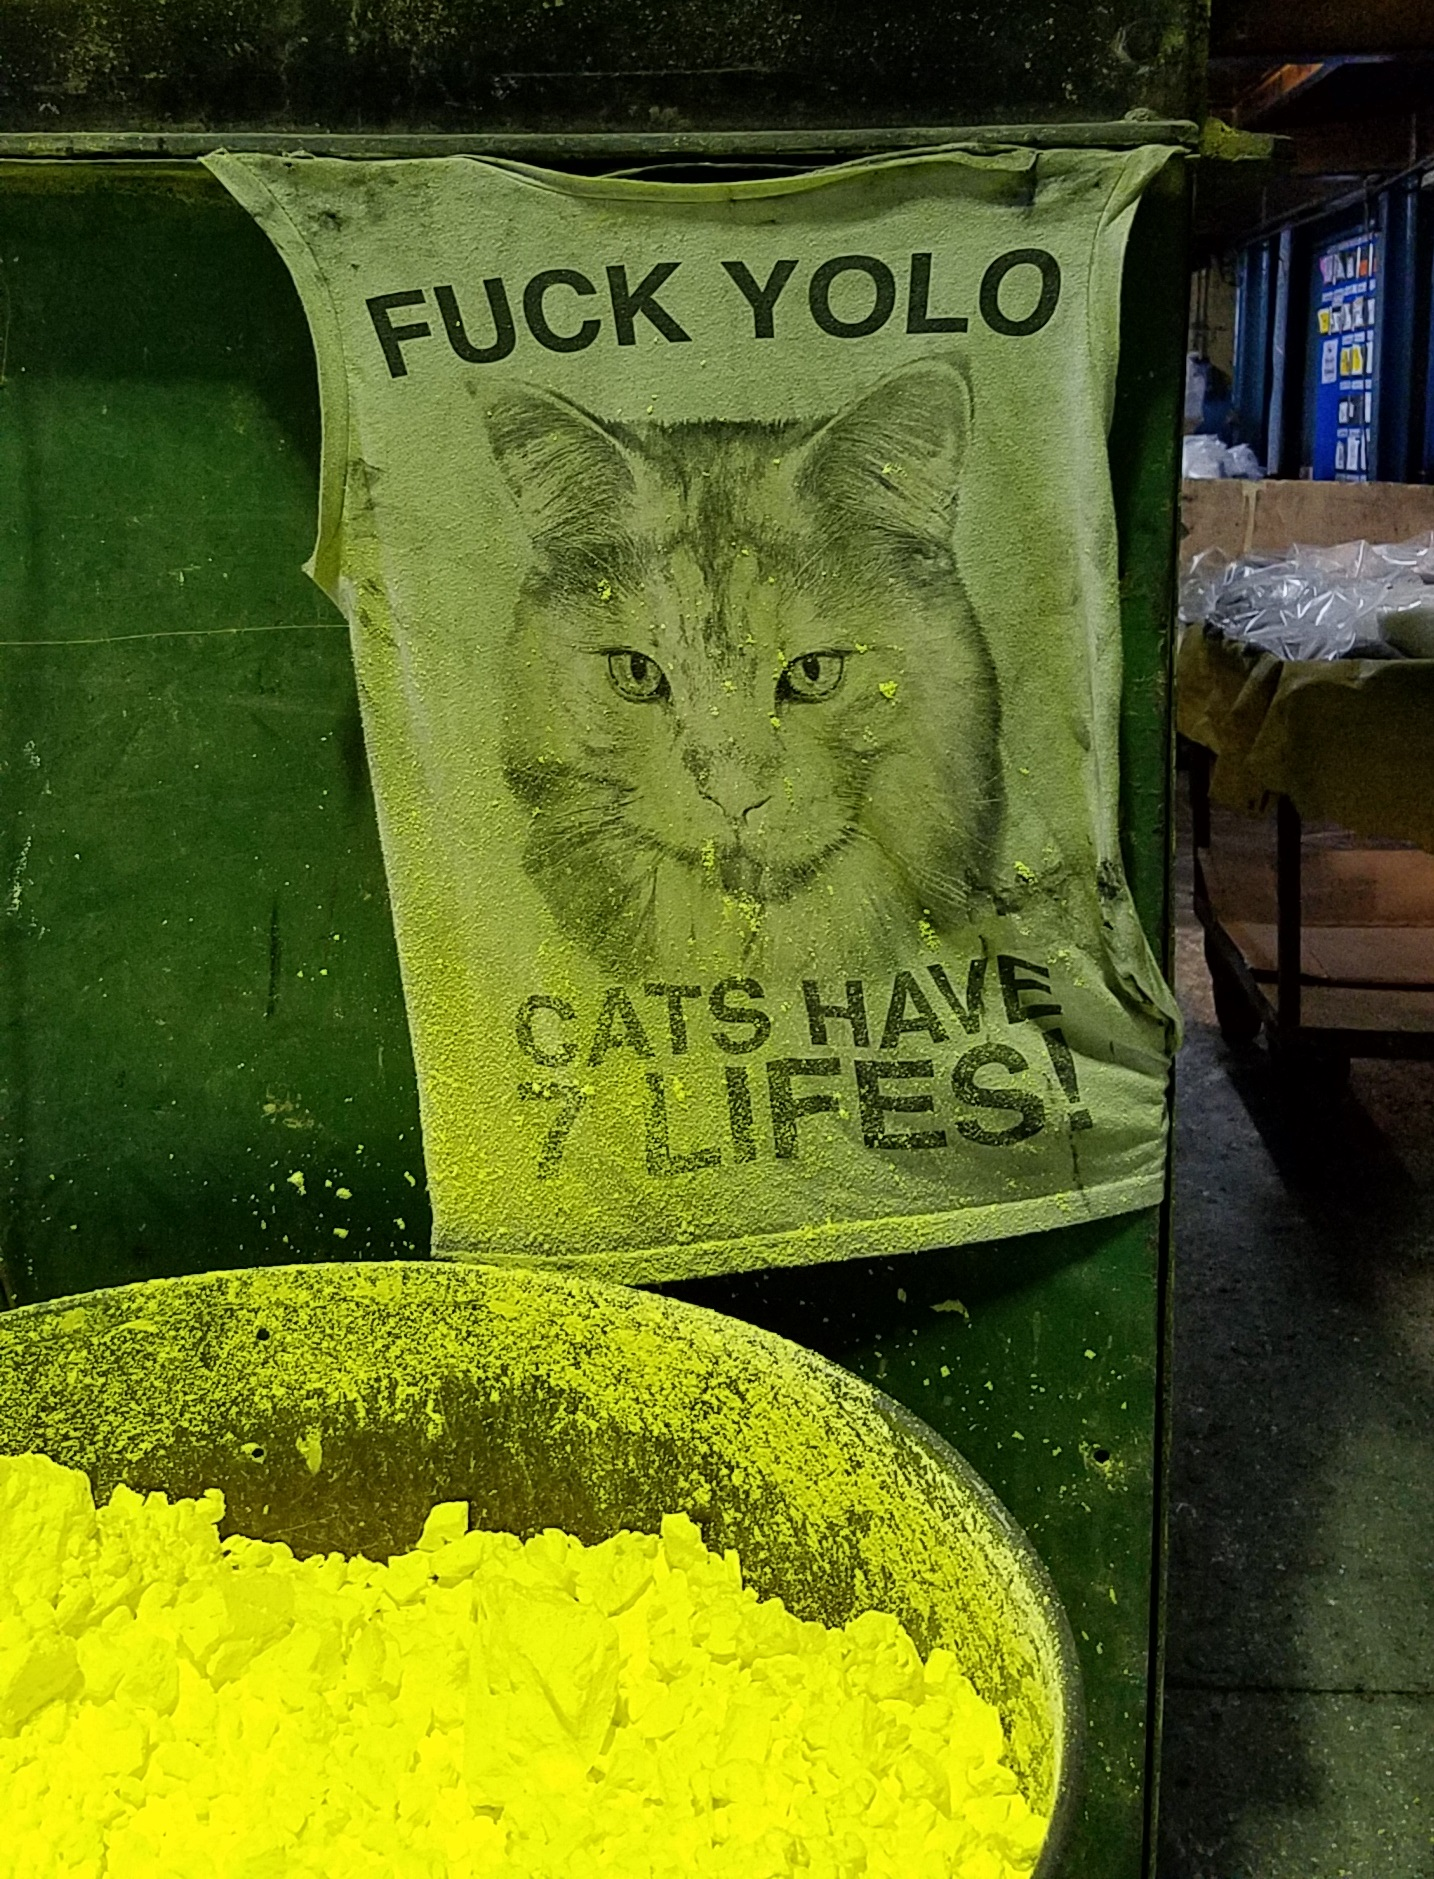 [Image] Sulfur Bin YOLO